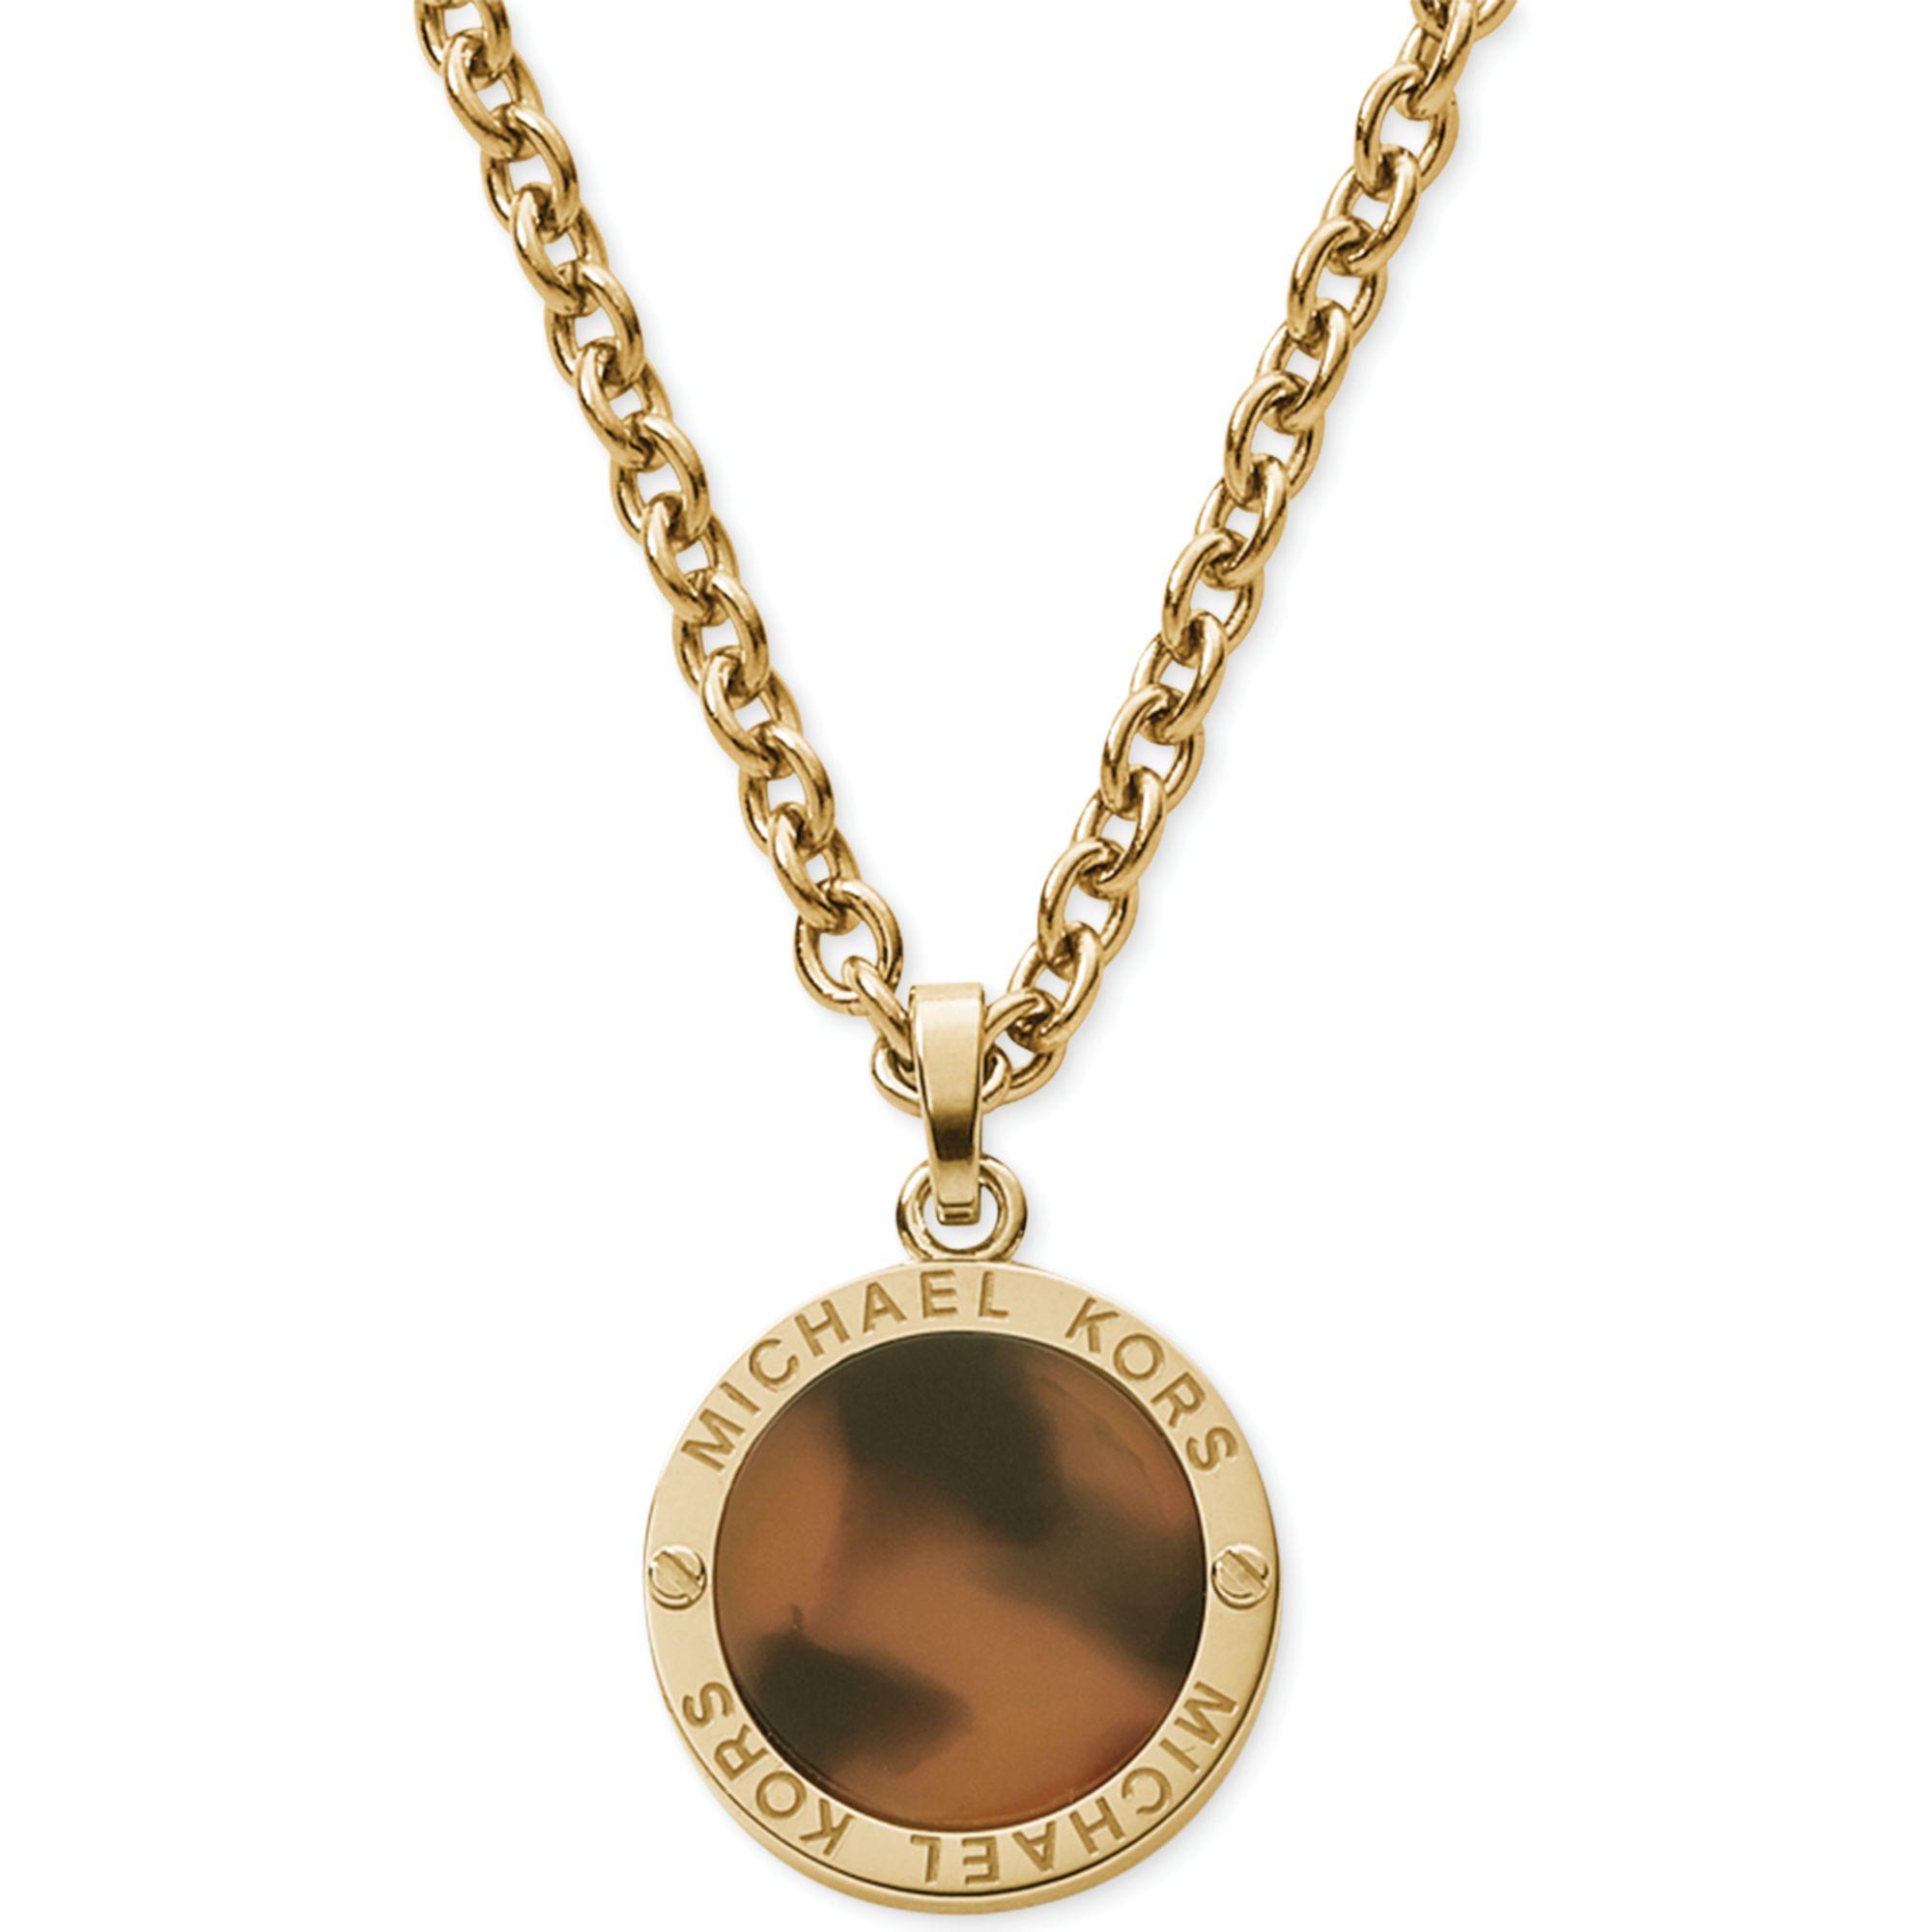 Michael Kors Goldtone Logoetched Tortoise Small Disc